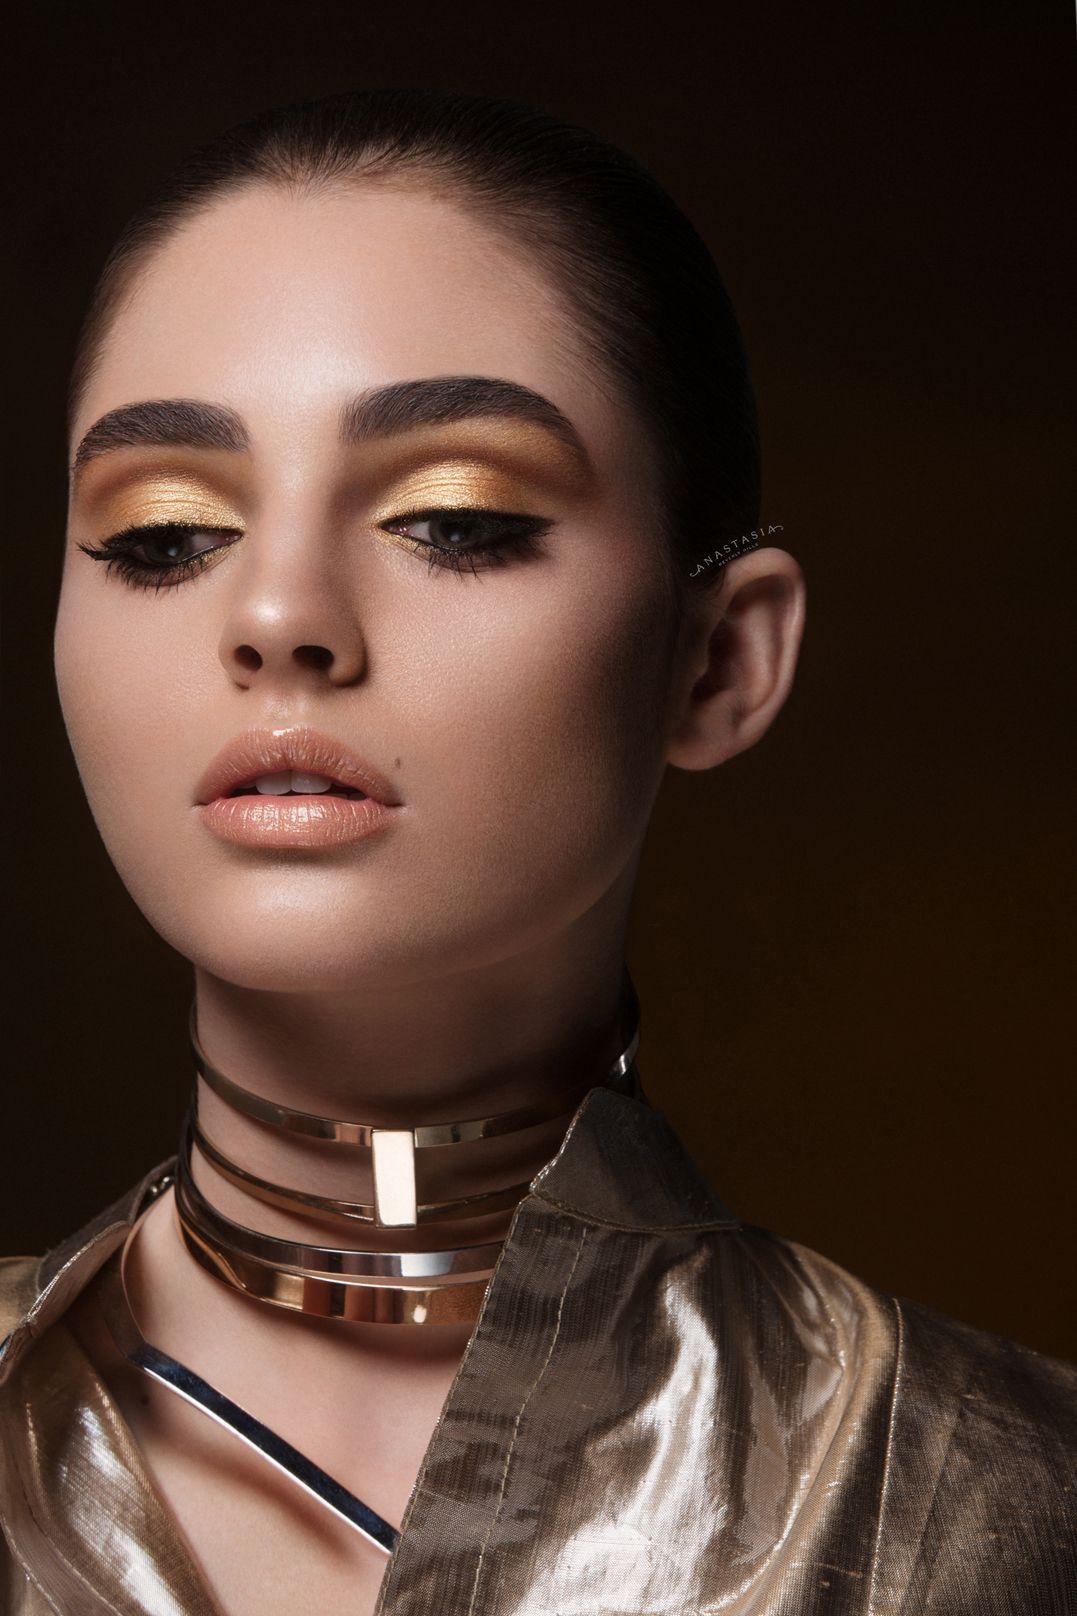 P R I S M abhprism anastasiabeverlyhills Makeup